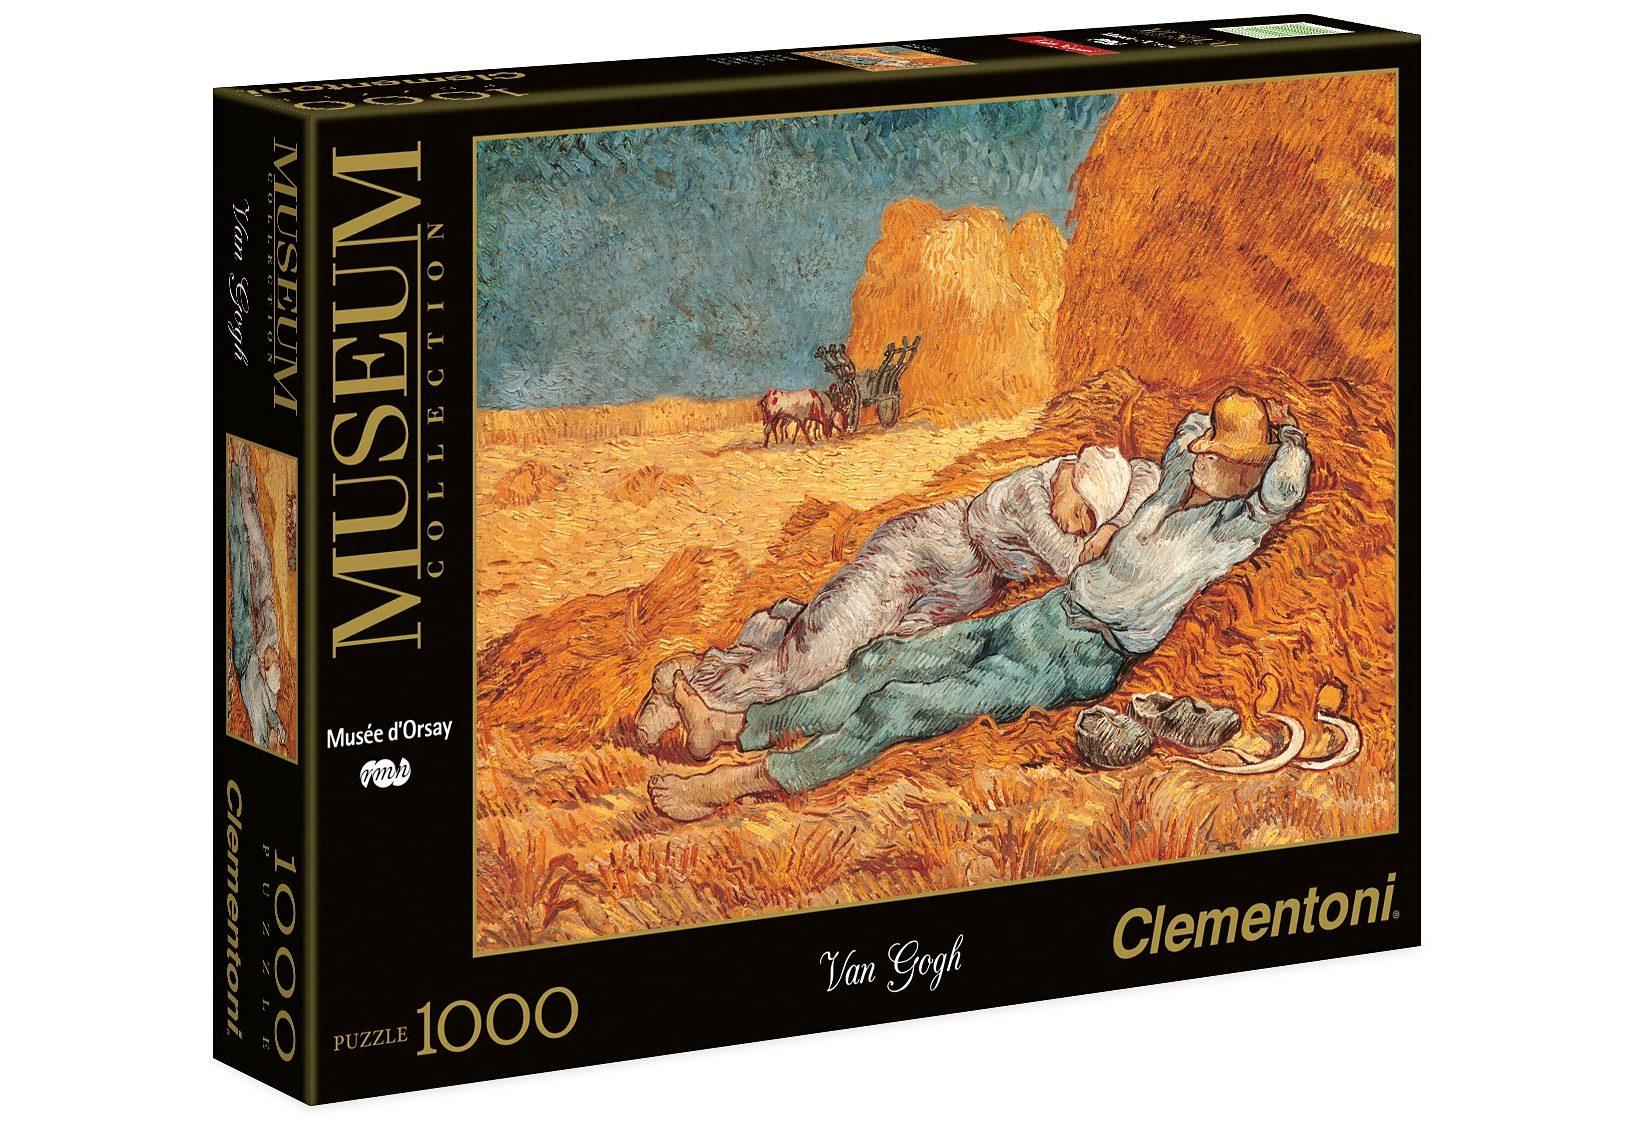 Clementoni Puzzle, 1000 Teile, »Musee D'Orsay, van Gogh - Mittagsrast«